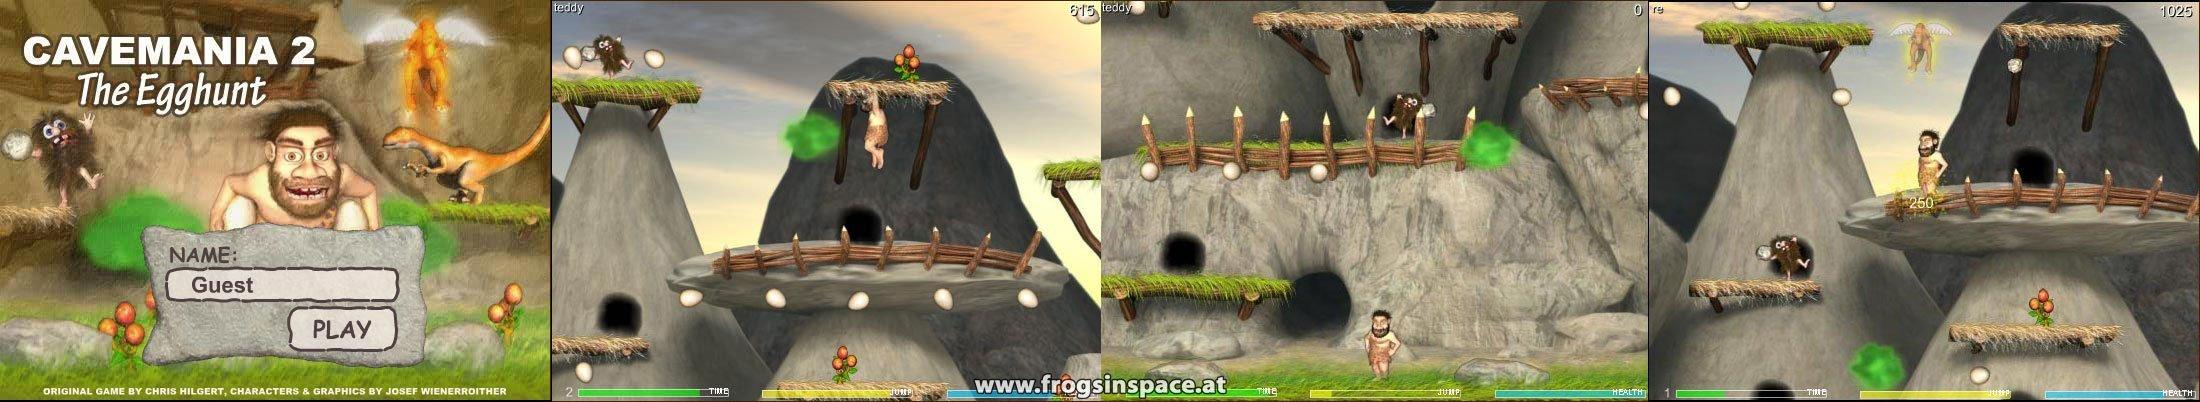 Caveman_Egghunt_Banner2